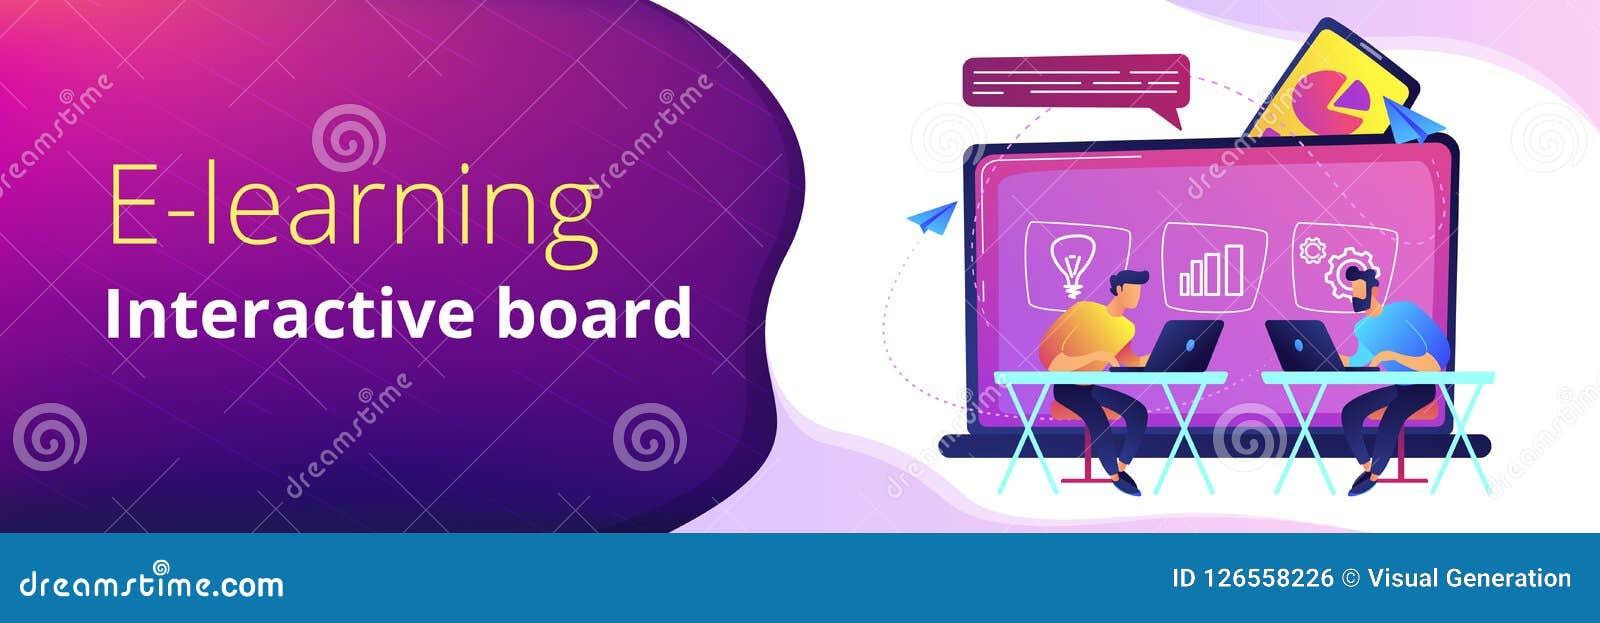 Digital Learning Header Or Footer Banner Stock Vector Illustration Of Header Learning 126558226